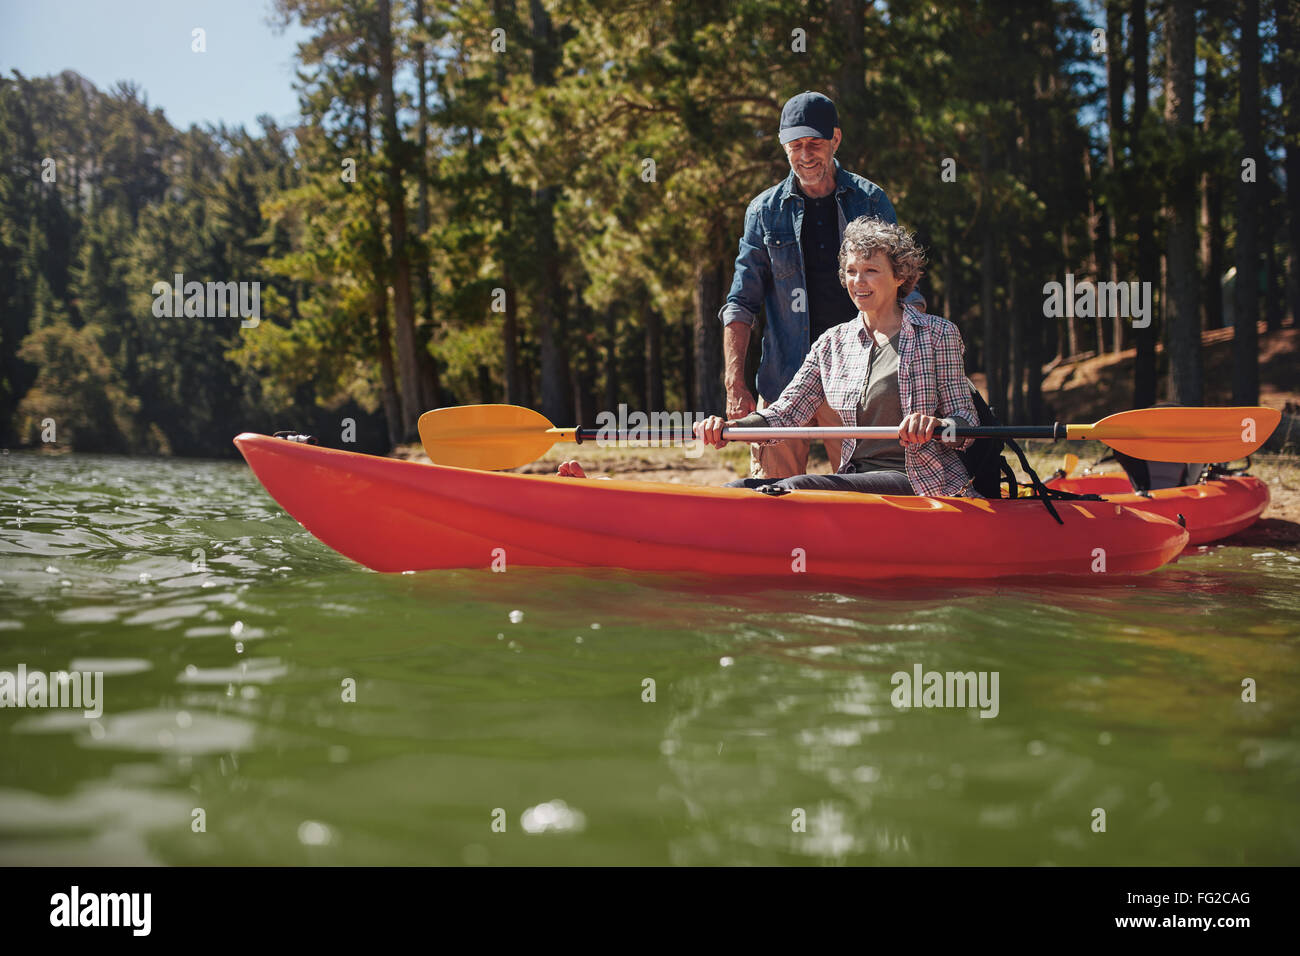 Portrait of mature man giving instructions to woman paddling kayak dans le lac. Senior woman getting kayak leçons Photo Stock